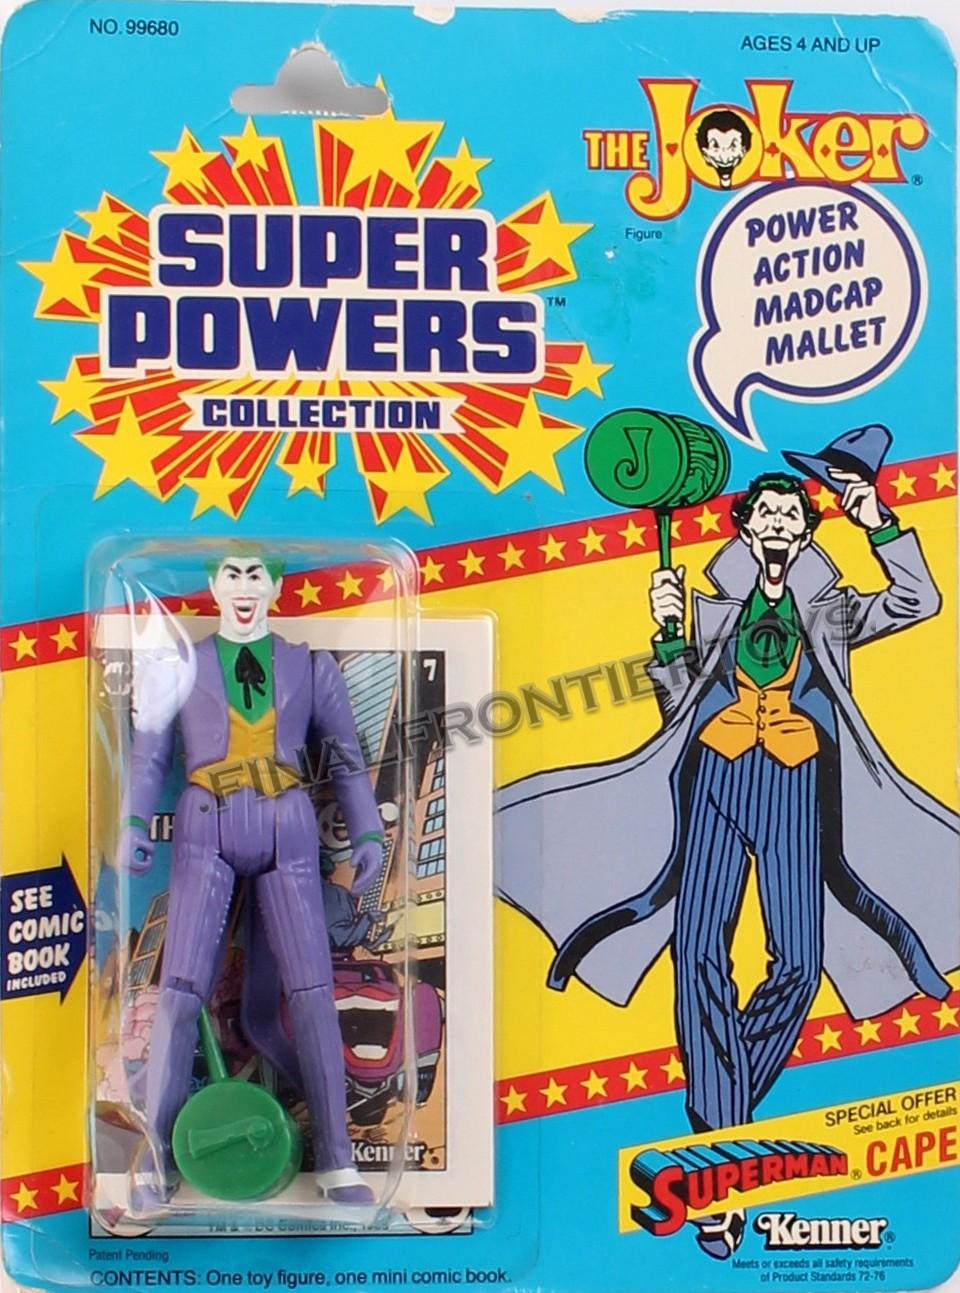 Joker (SuperPowers Figure)